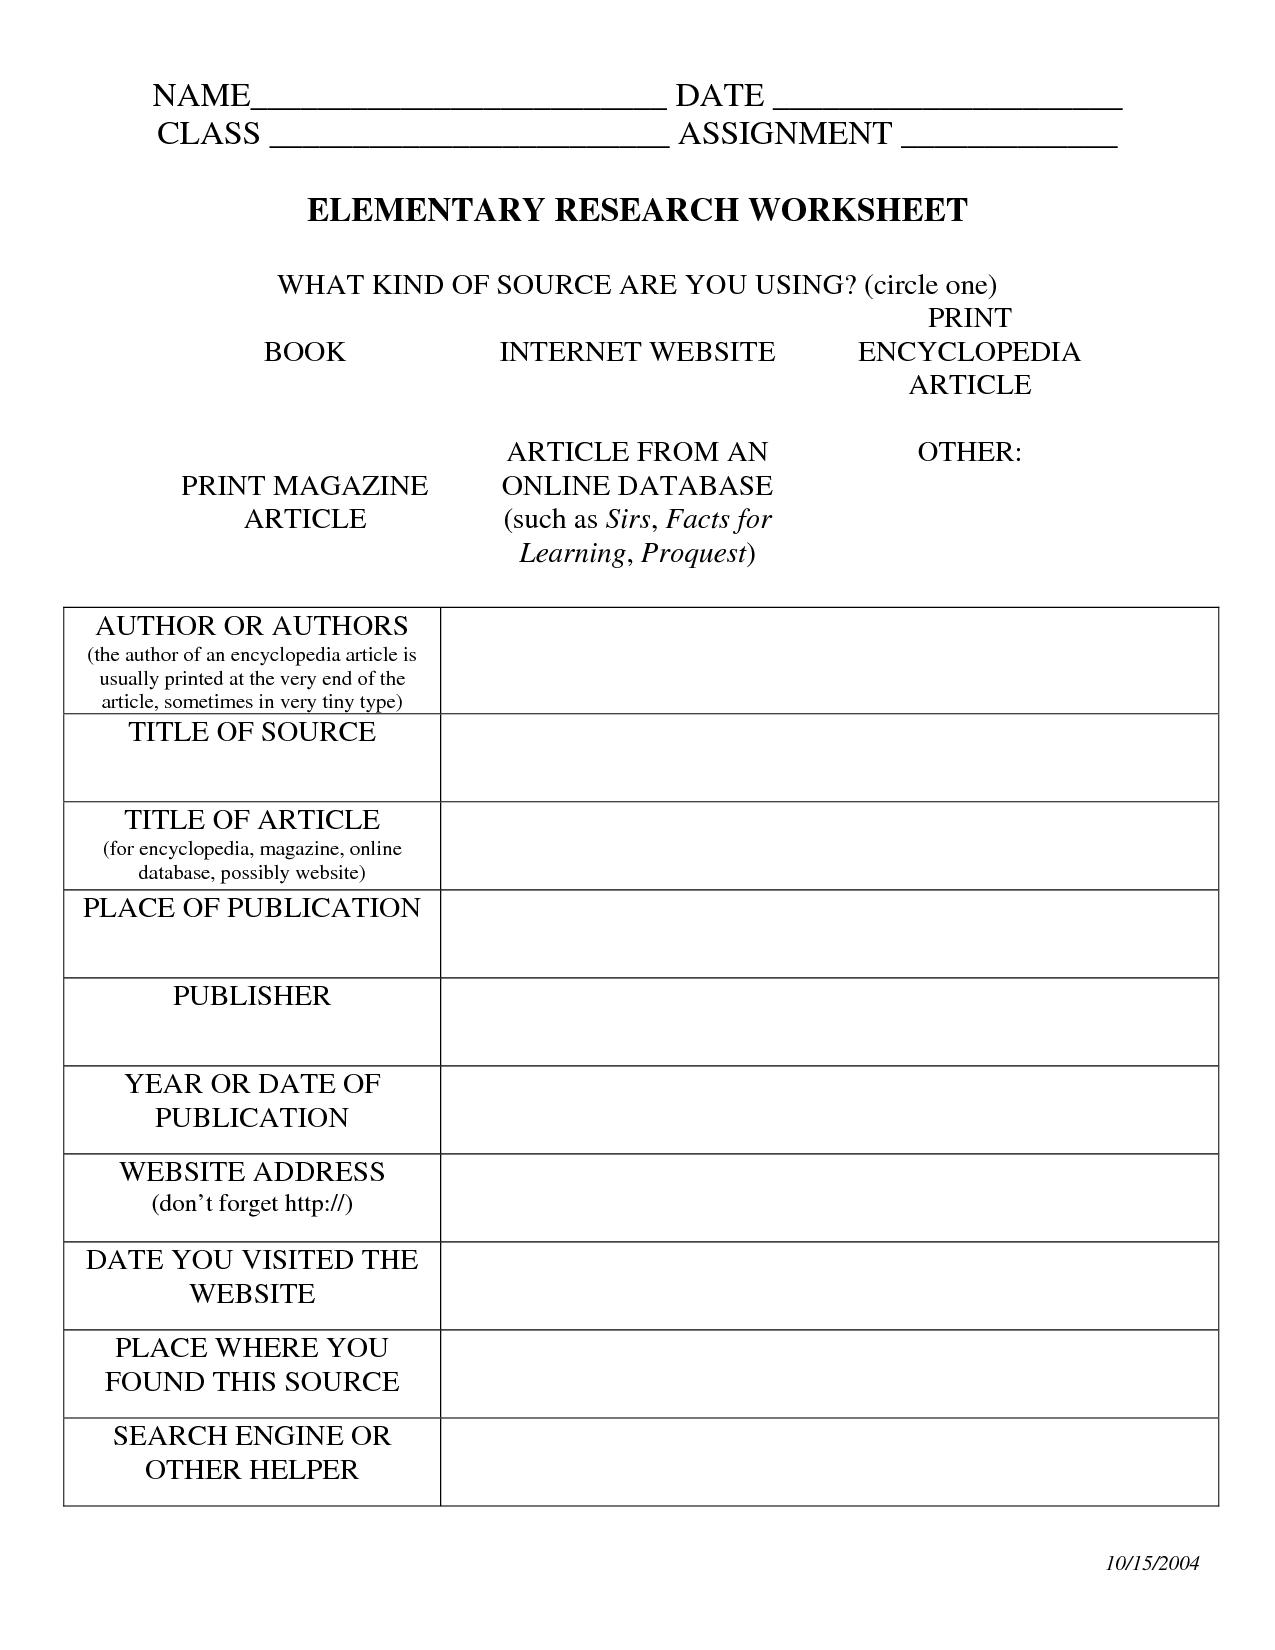 Elementary Hypothesis Worksheet